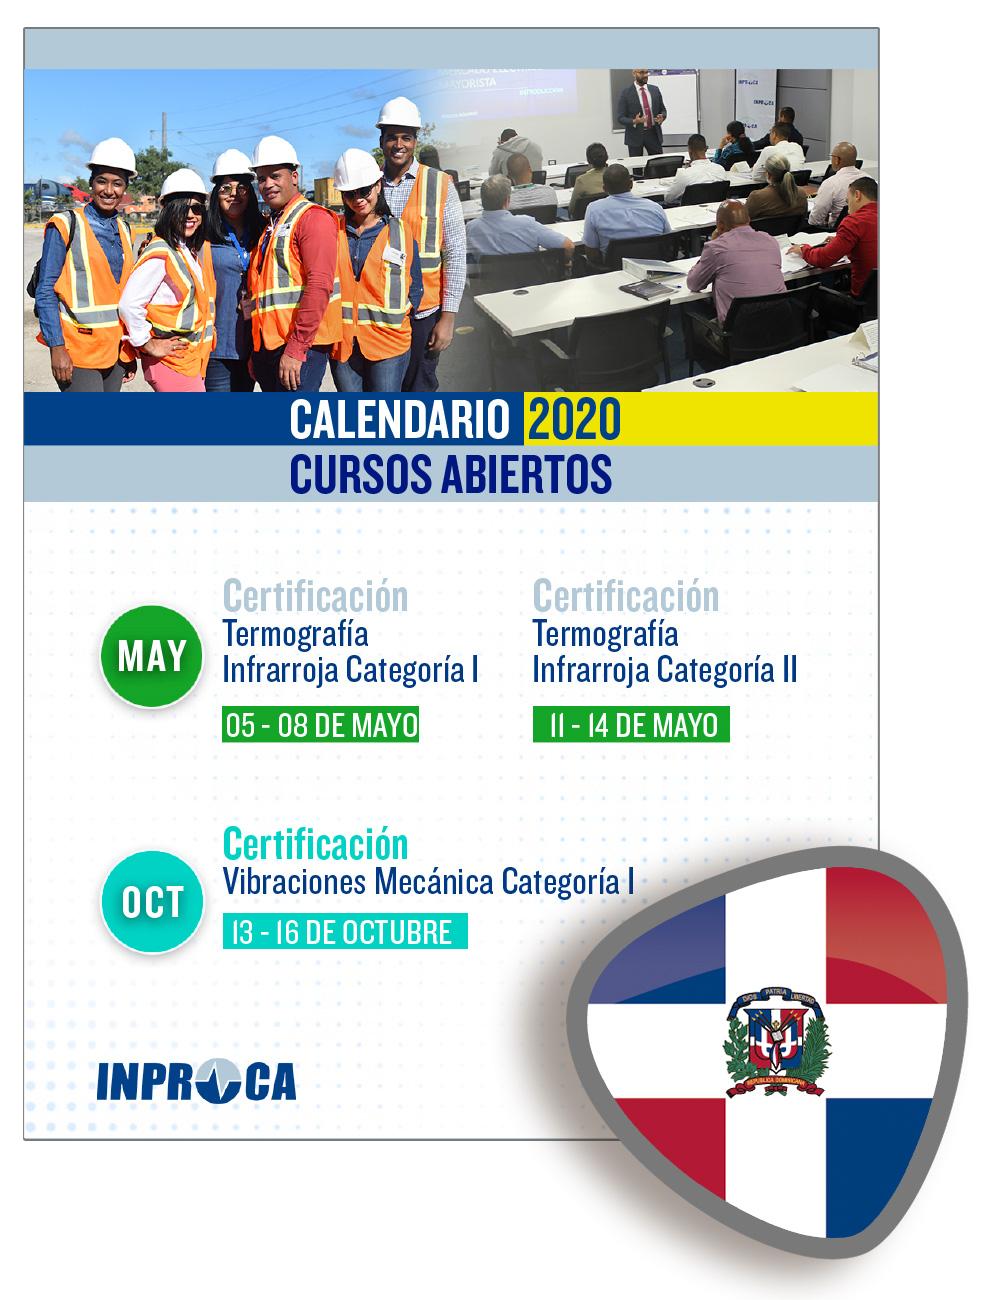 Inproca - República Dominicana - Calendario de Cursos 2020